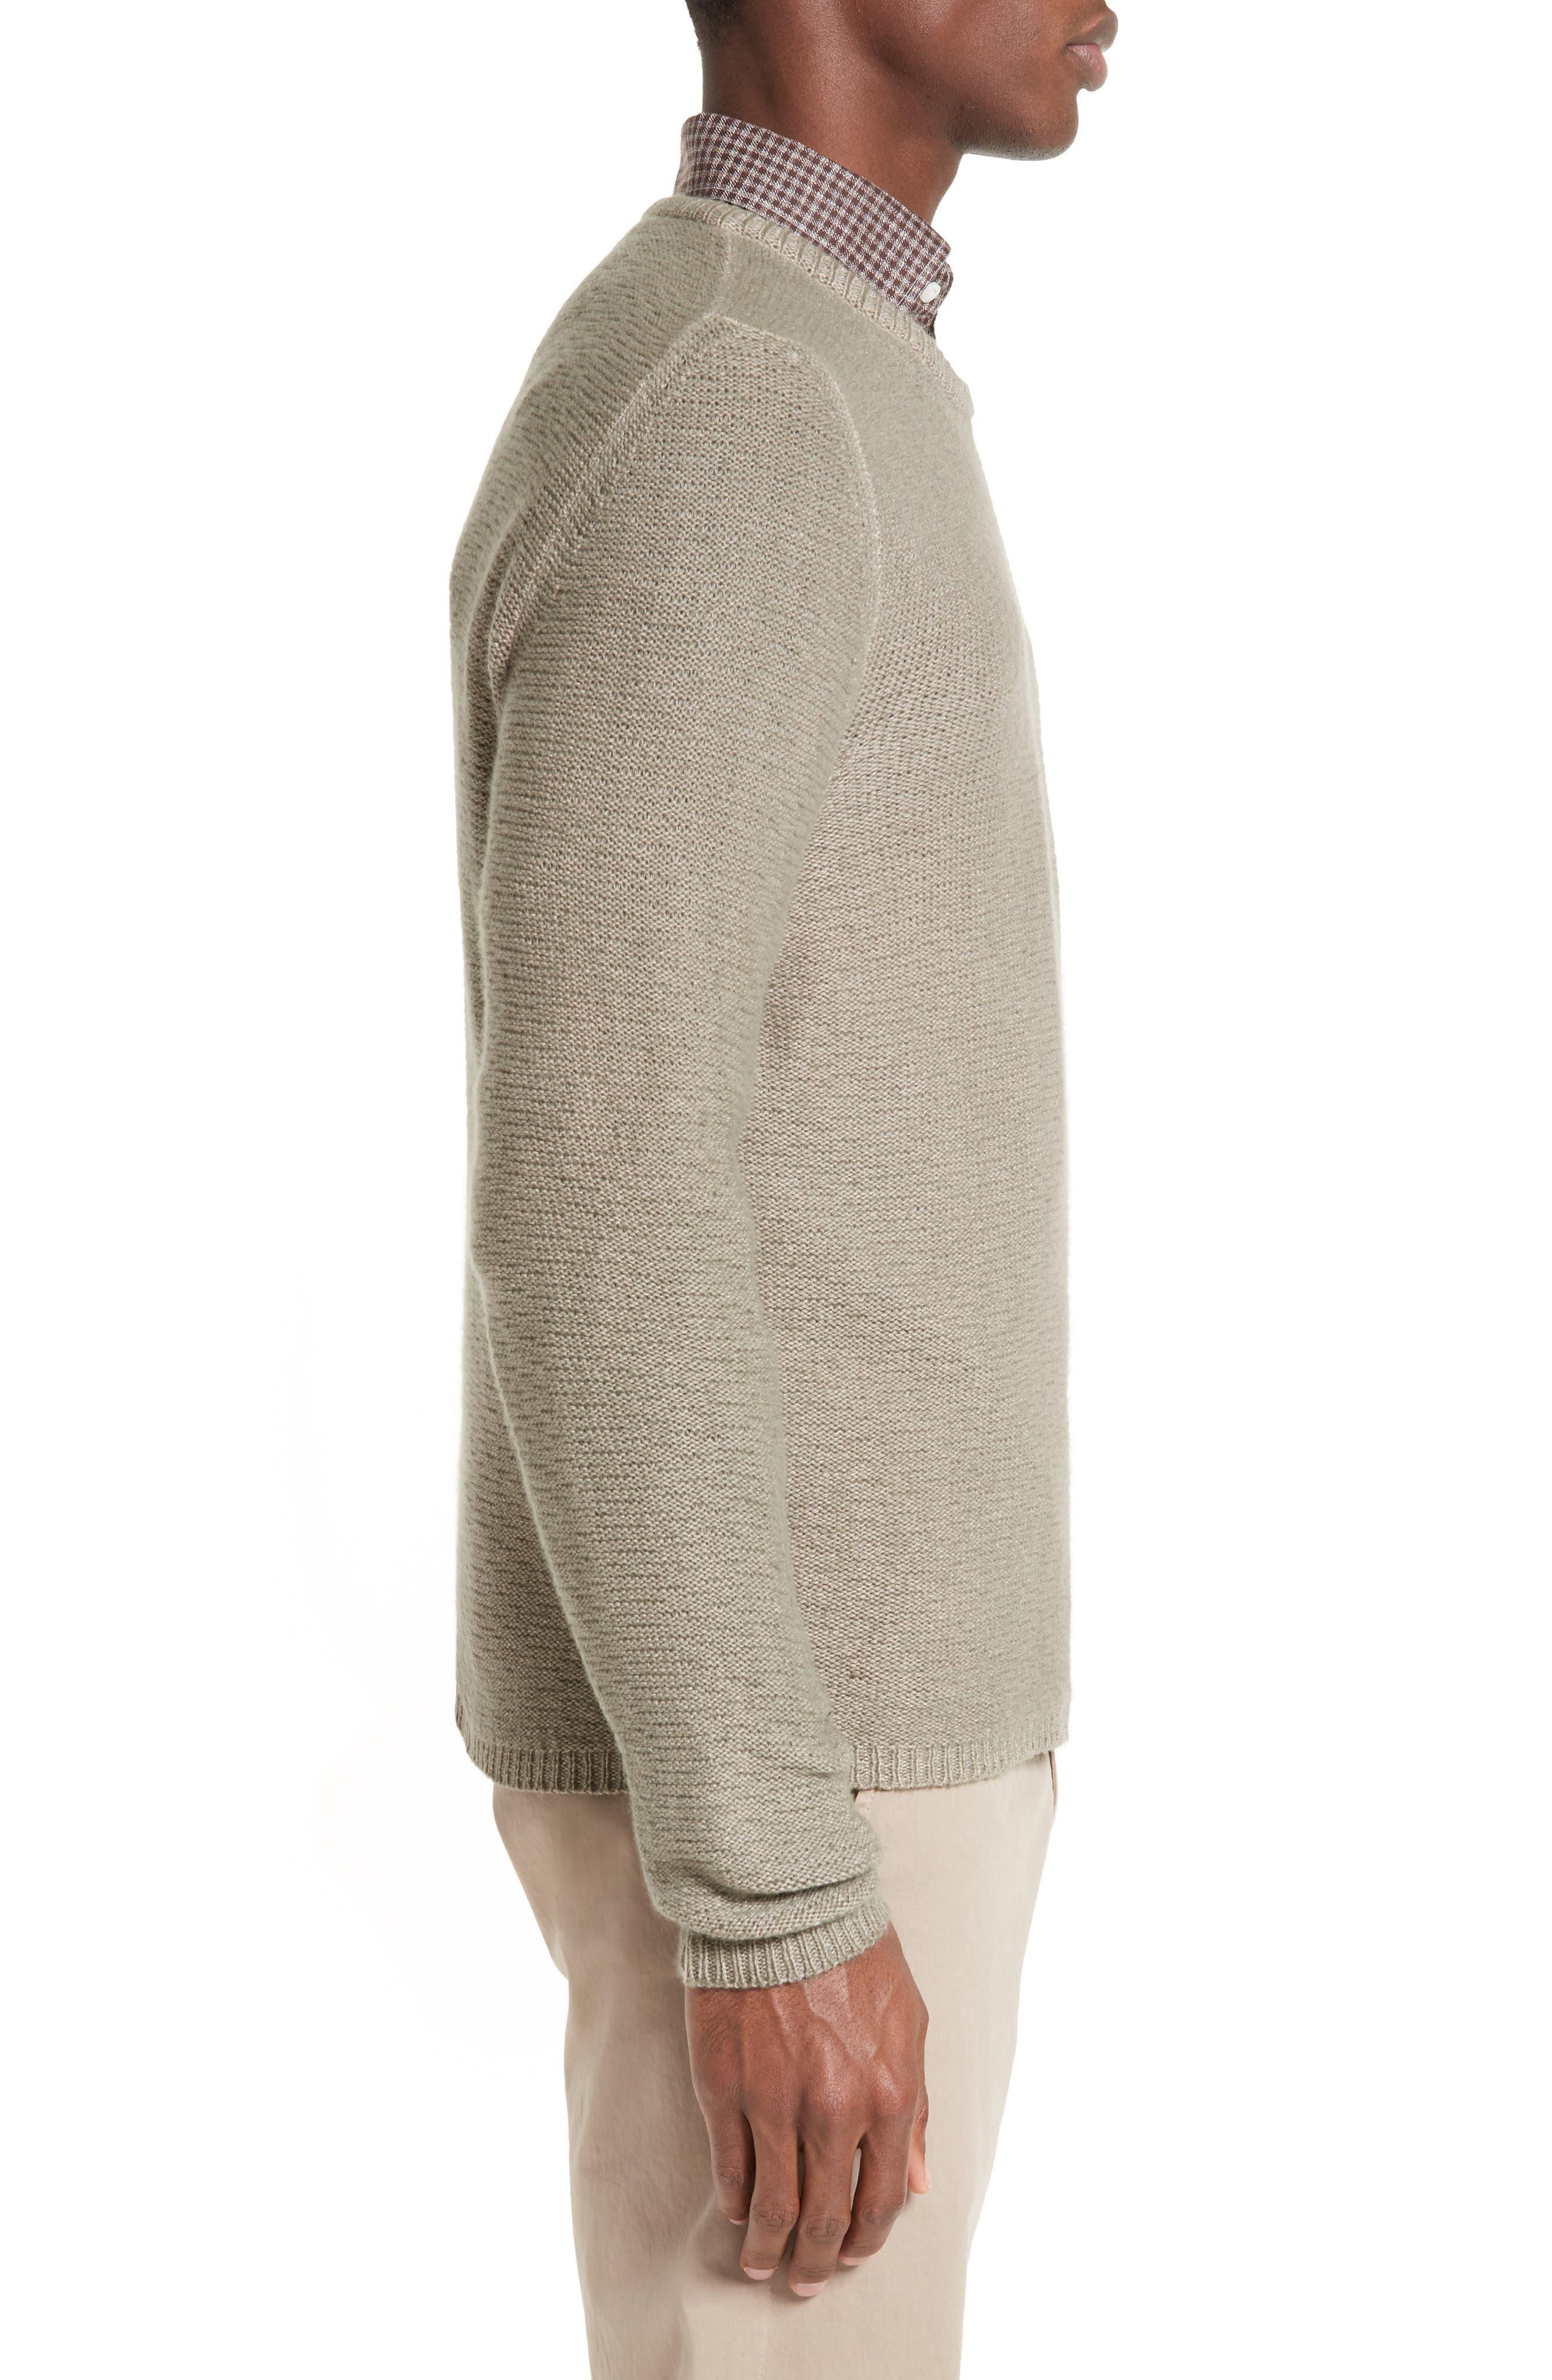 Napoli Slub Cashmere Sweater,                             Alternate thumbnail 3, color,                             200